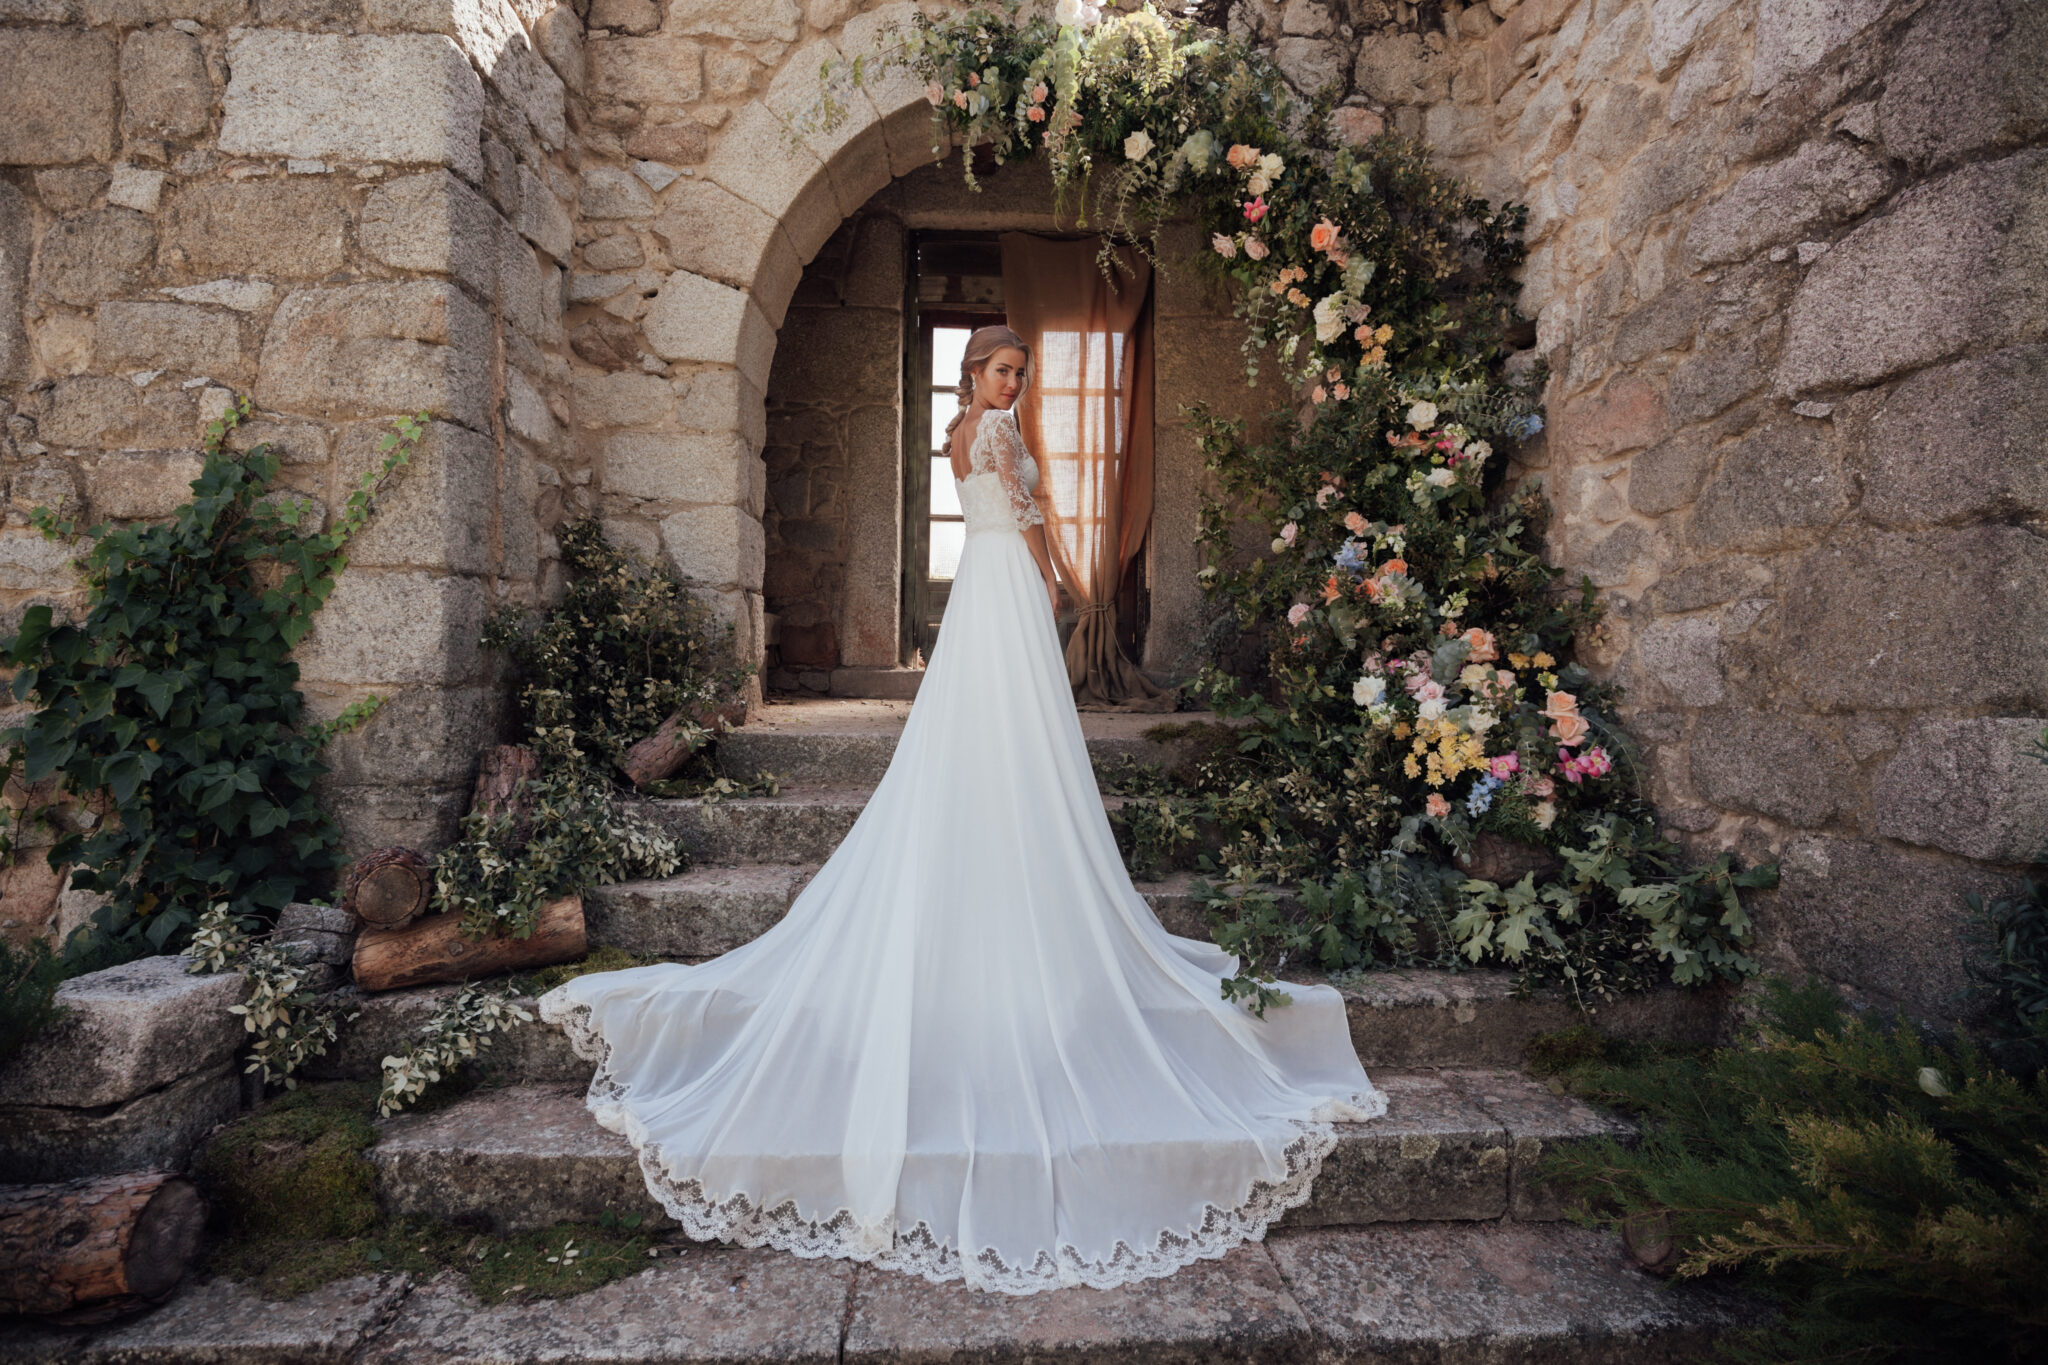 Sesión novios boda influencer vestido a medida en Finca el Gasco